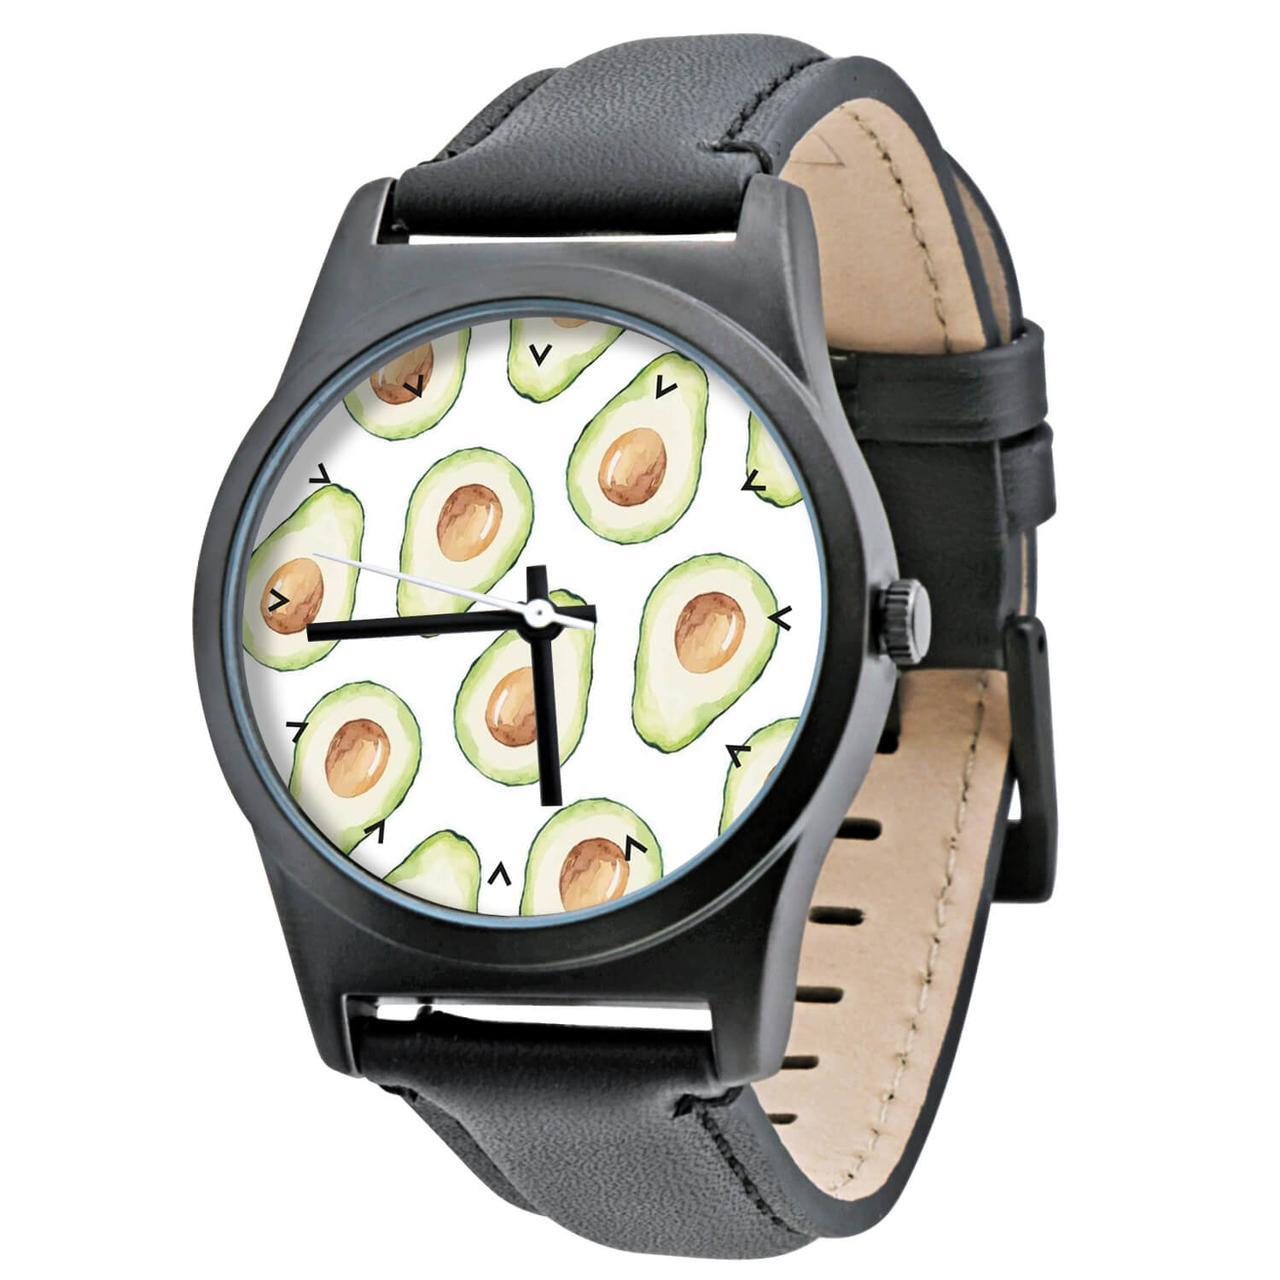 Годинник ZIZ Авокадо + дод. ремінець + подарункова коробка